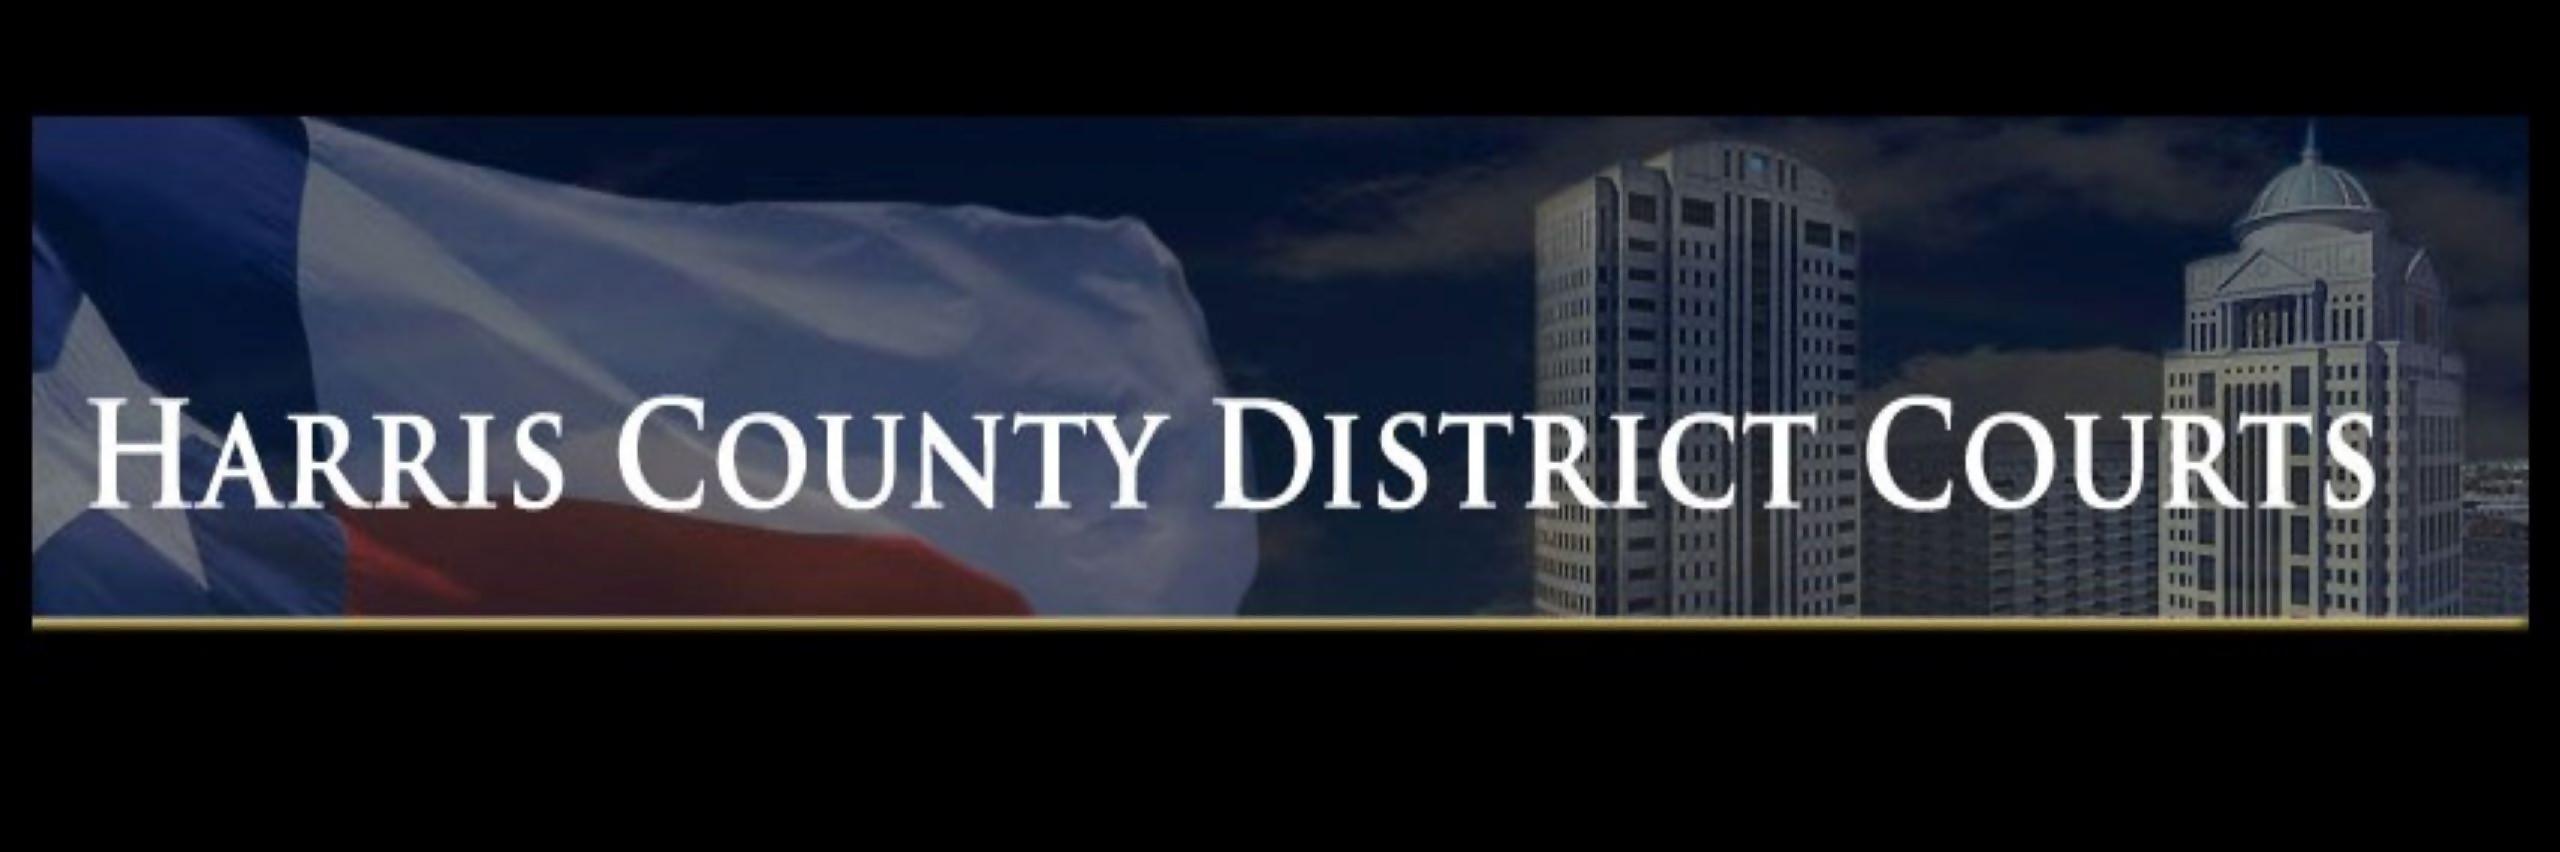 312th District Court - Live Stream